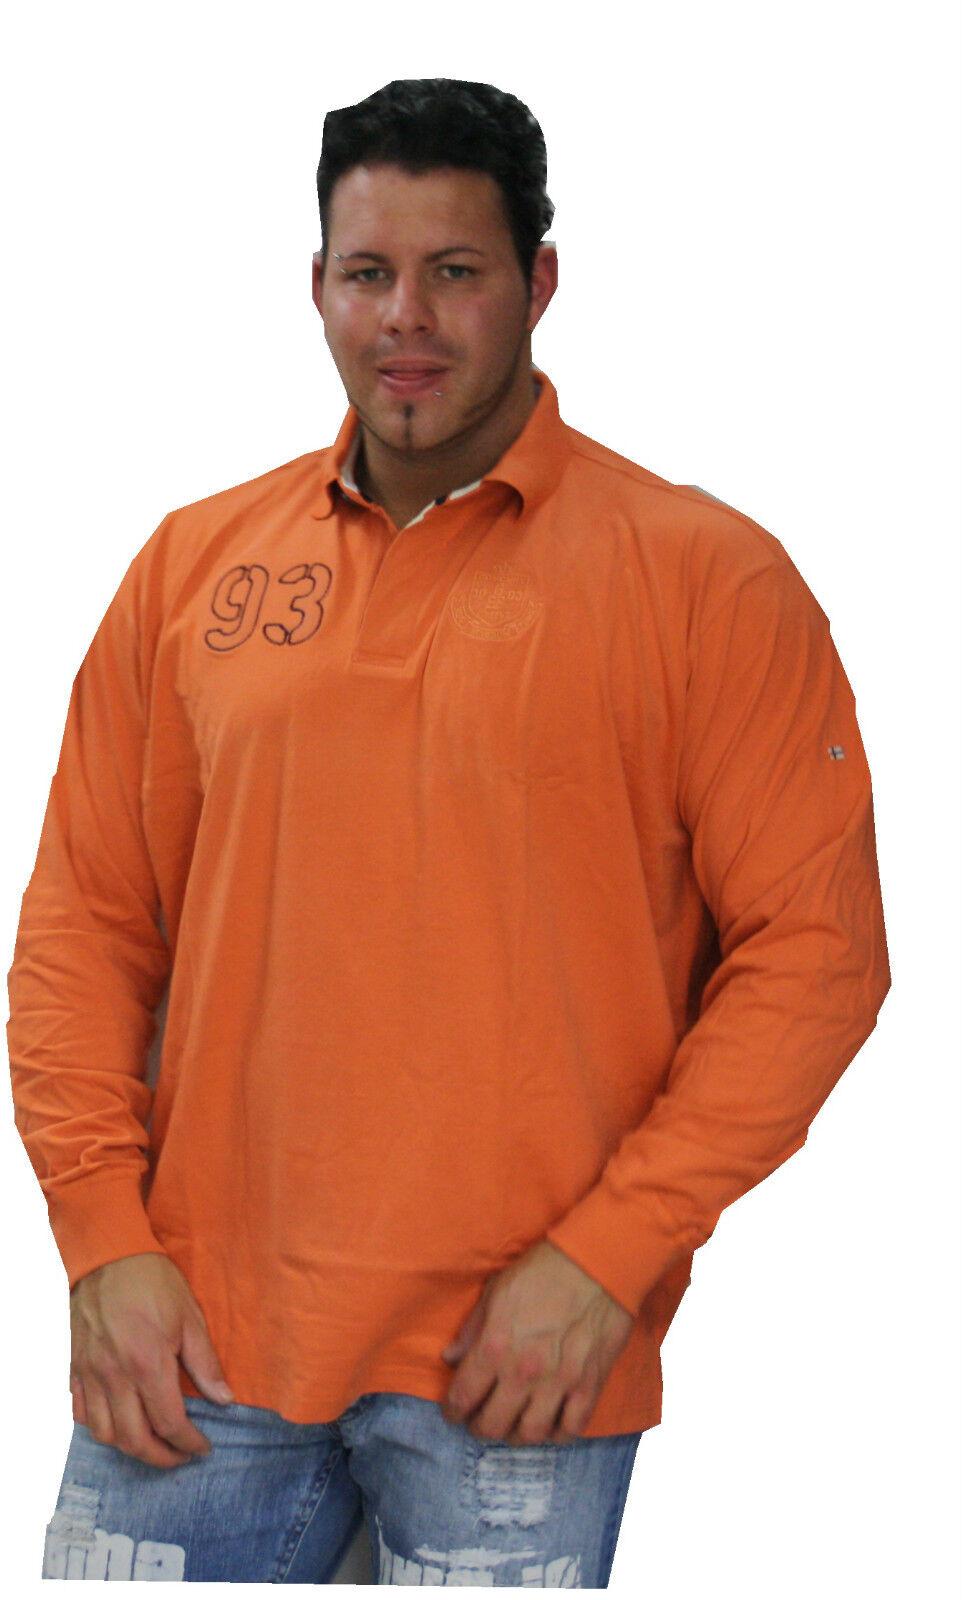 Xxl Übergrößen Herren wow Graustone Longsleeve wow Sweatshirt  4xl - 5xl